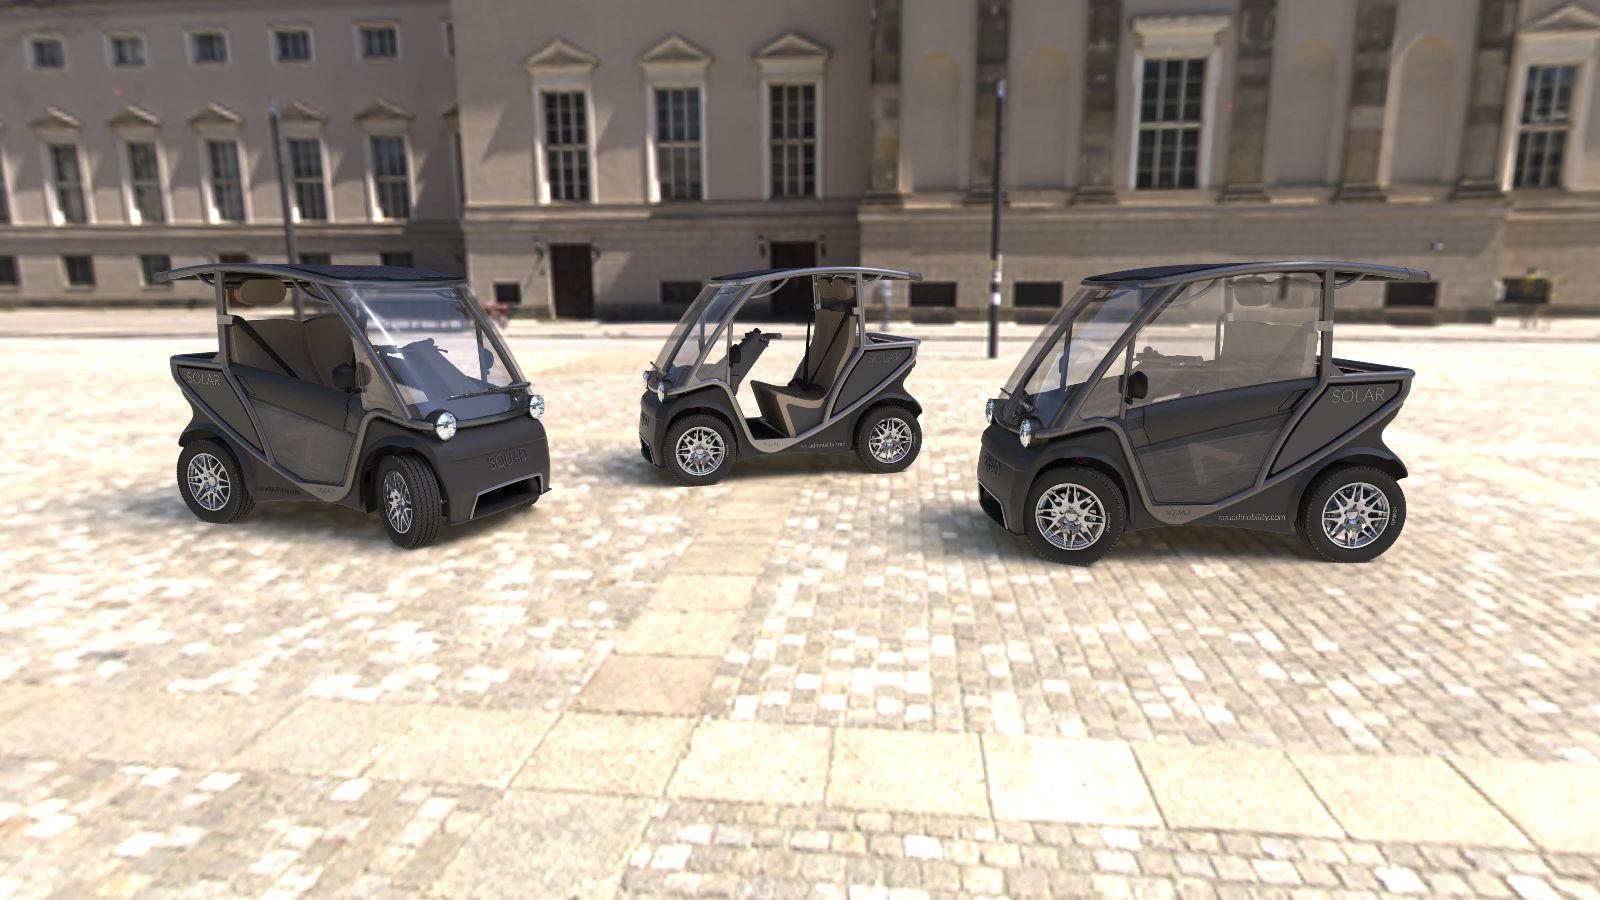 Squad Solar City Cars on Italian square doors